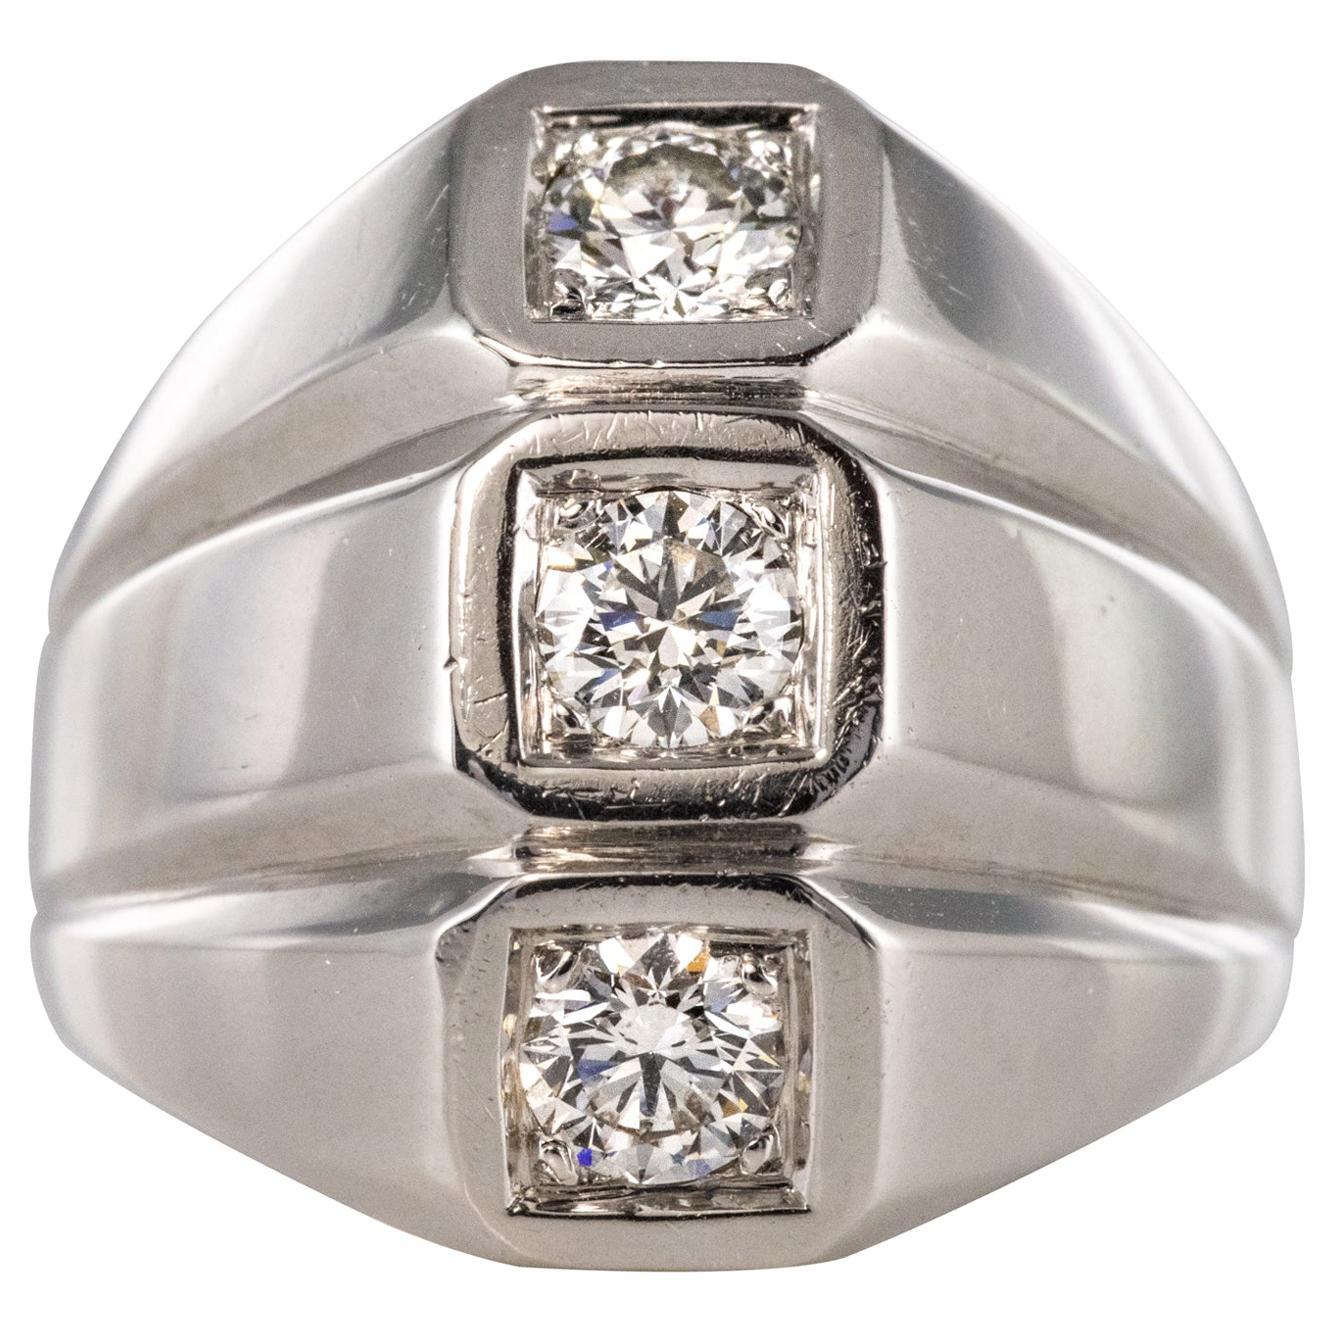 1950s Diamonds 18 Karat White Gold Modernist Ring